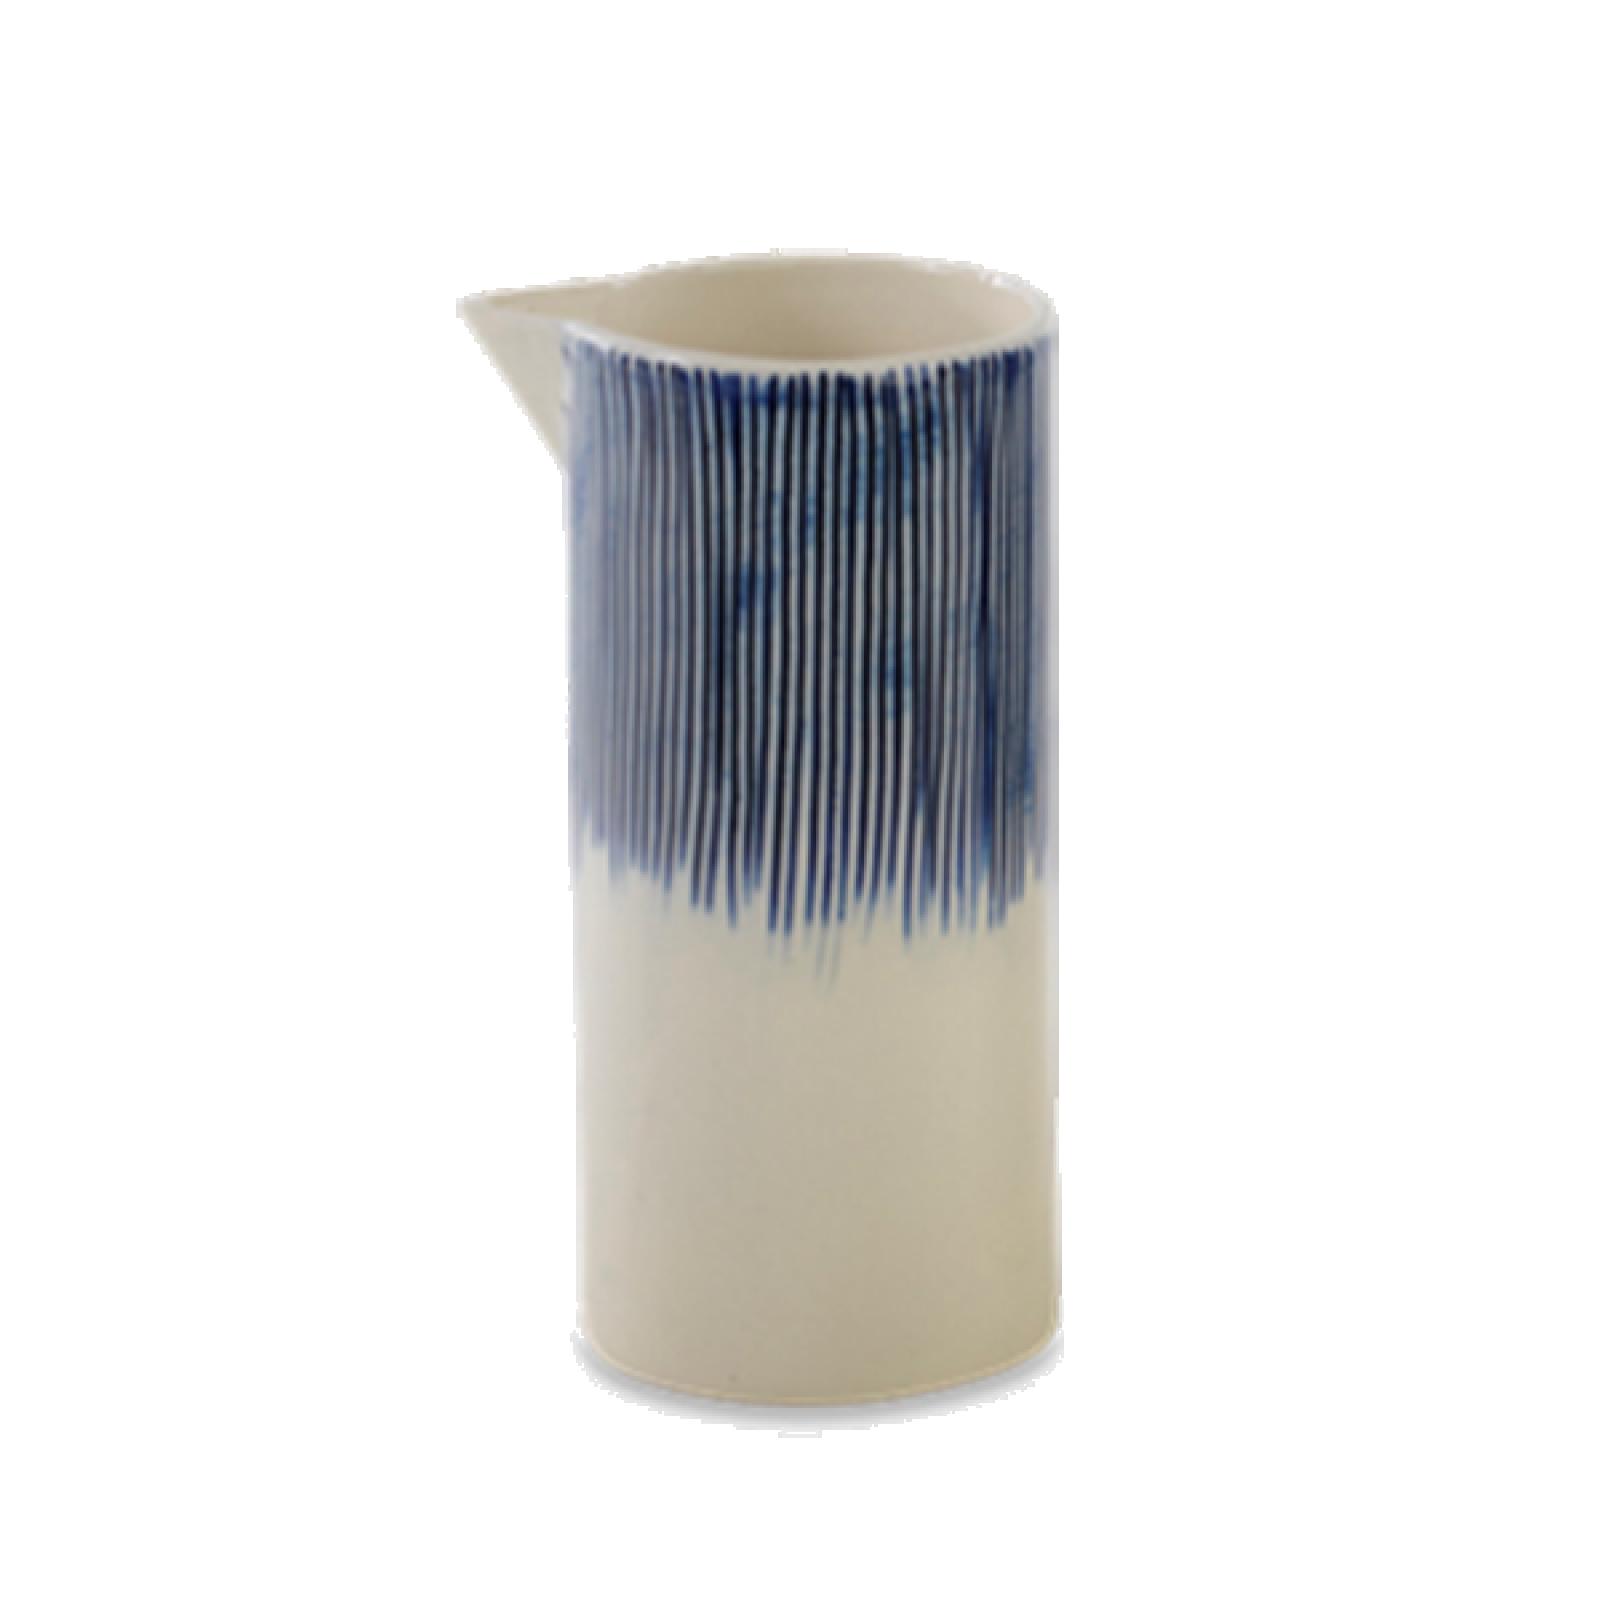 Small Karuma Ceramic Jug Blue & White thumbnails